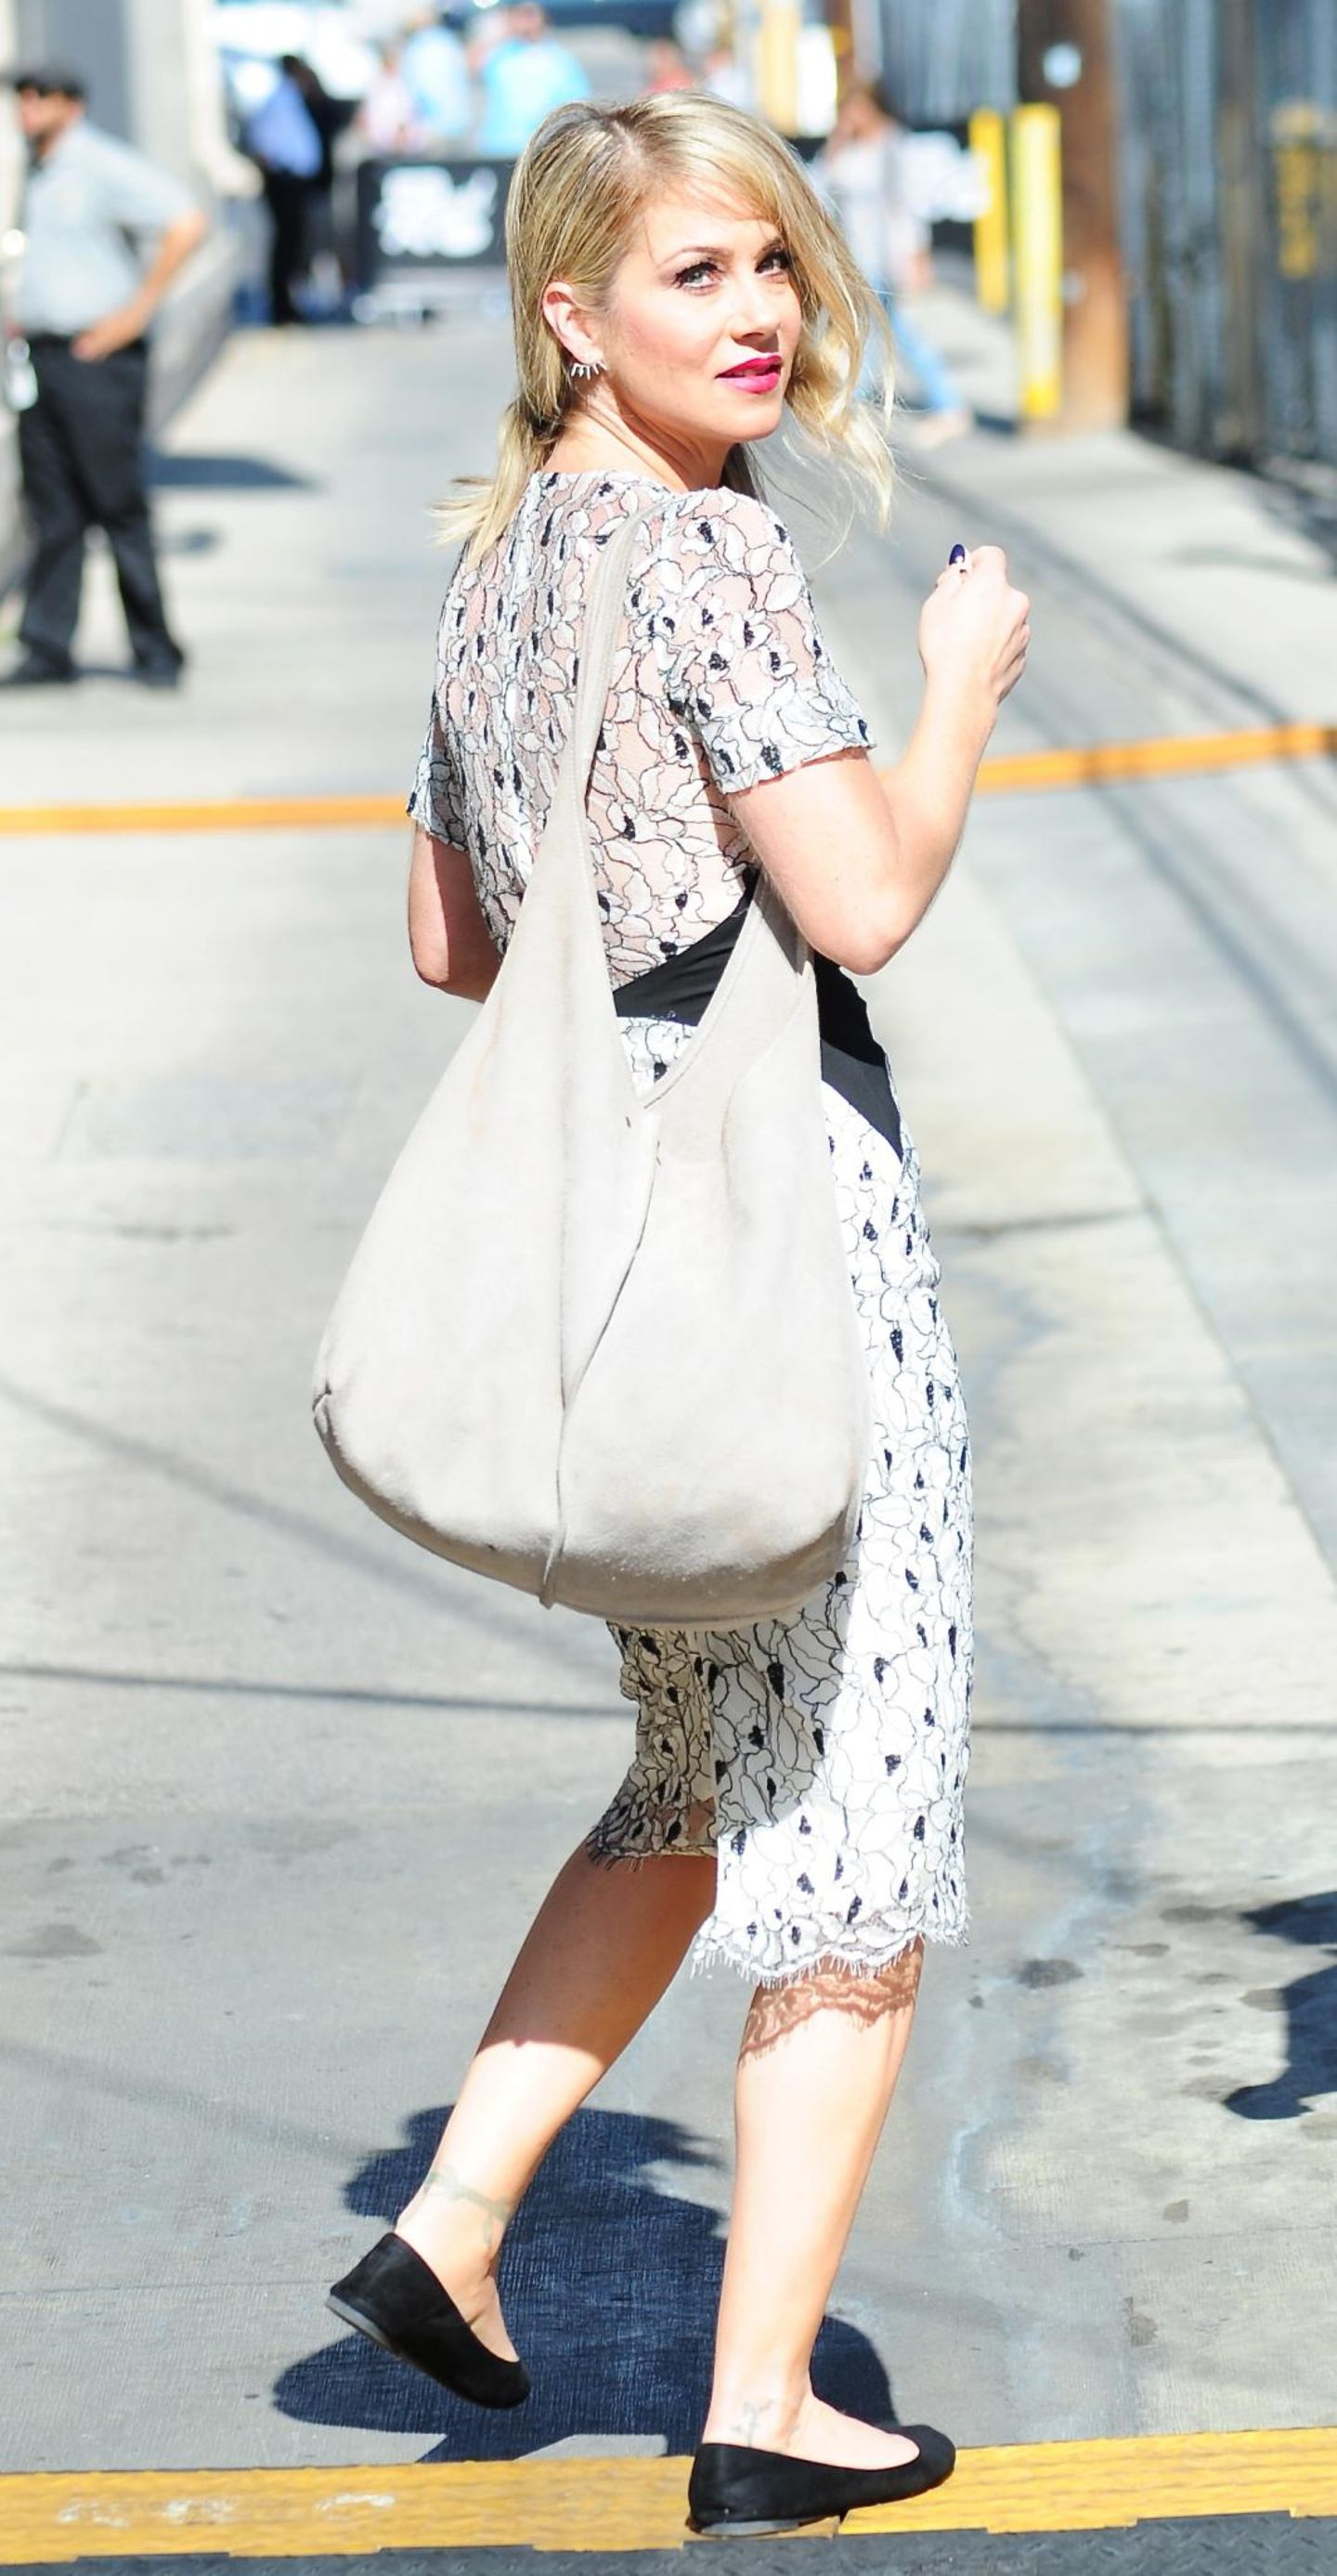 29. Juli 2015: Christina Applegate kommt in Hollywood an. Sie ist Gast bei Jimmy Kimmel LIVE.